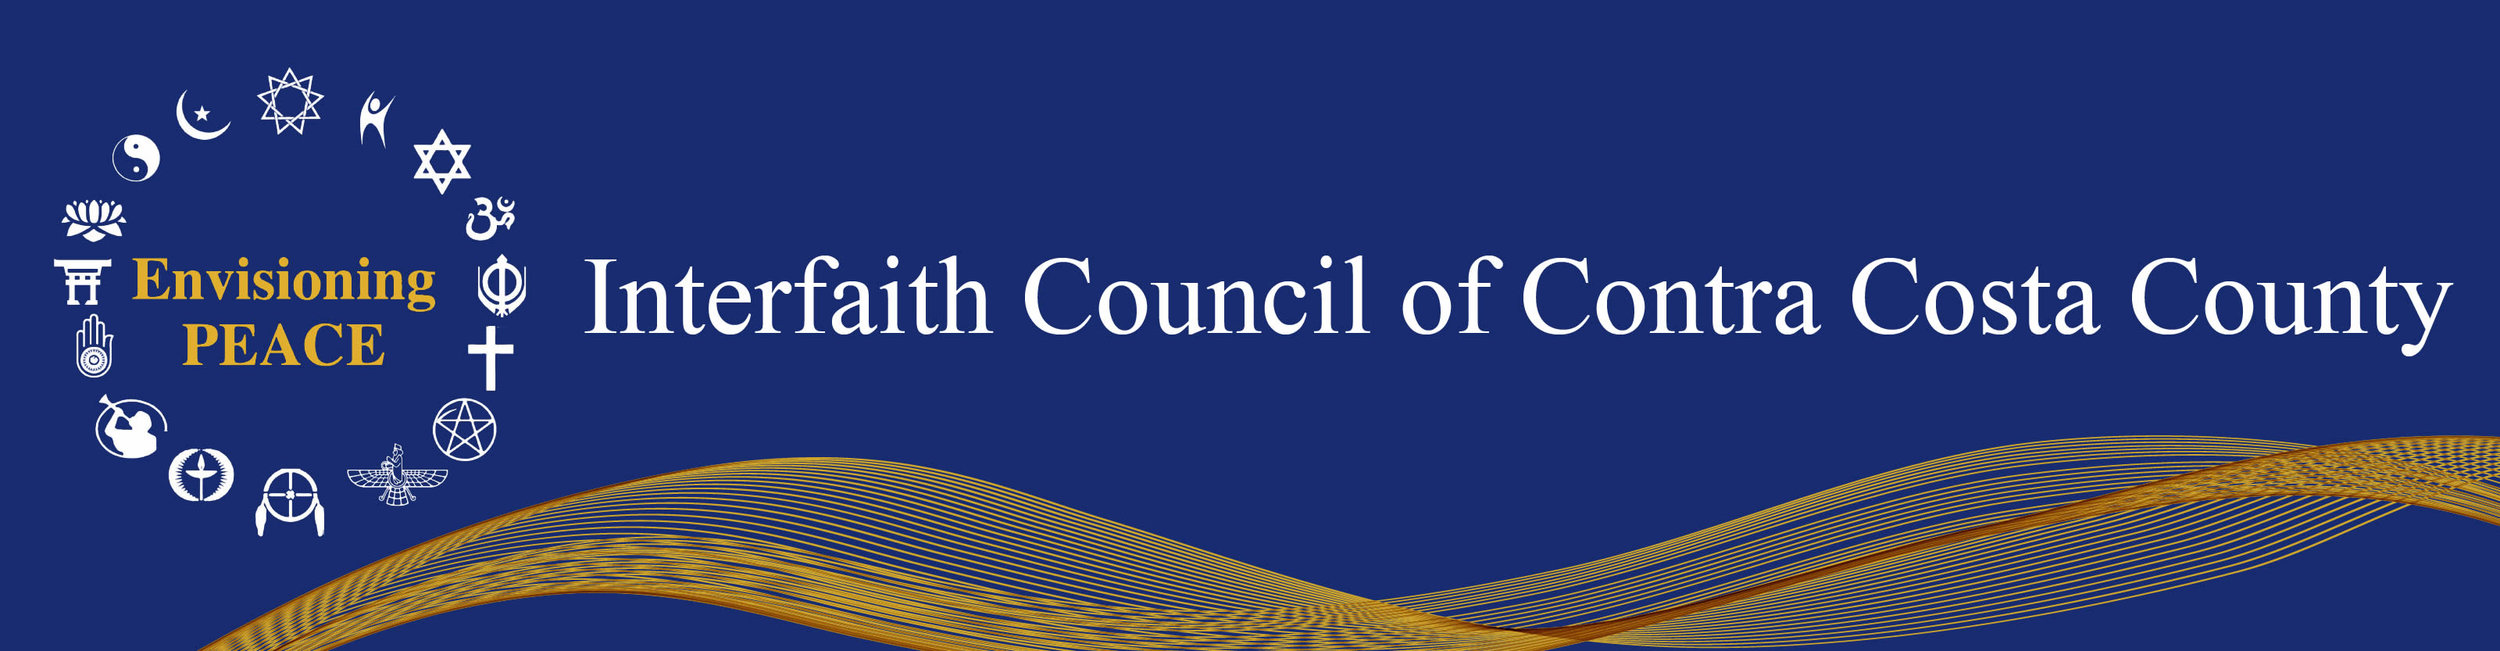 ICCCC-header.jpg